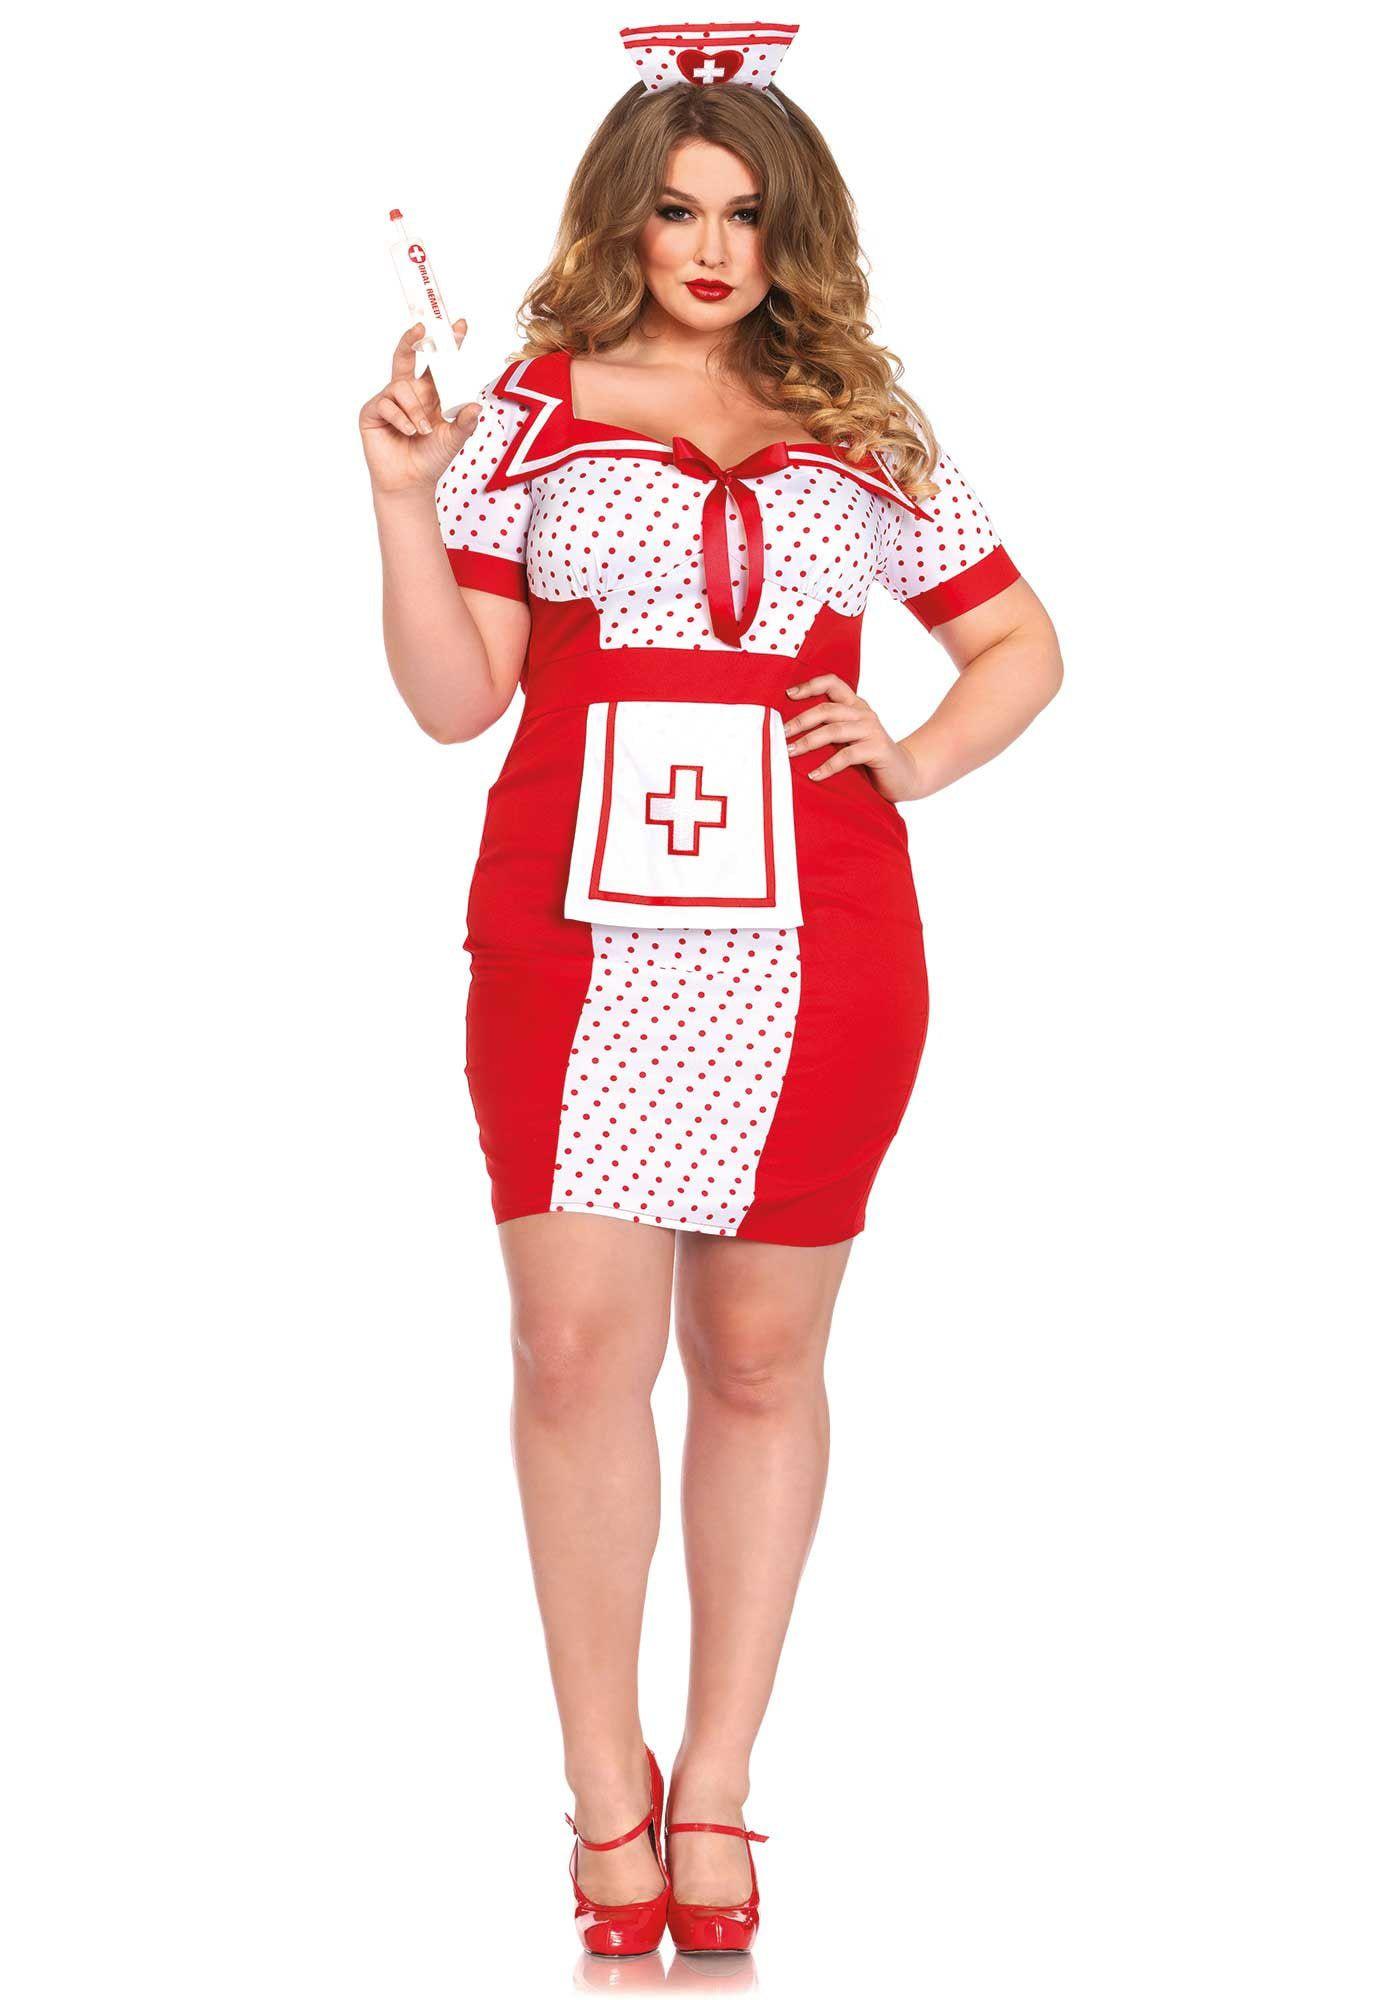 Wit-Rode Zorgzame Verpleegster Jurk (Plus Size) Vrouw